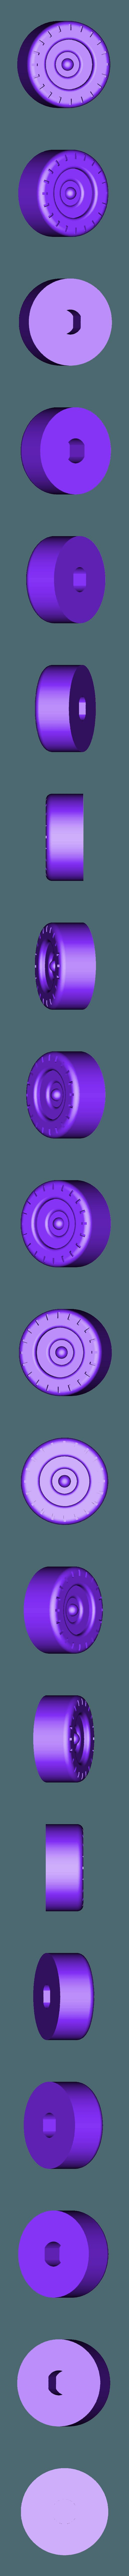 wheel.stl Download free STL file 1989 mini Batmobile • 3D printable model, Dsk